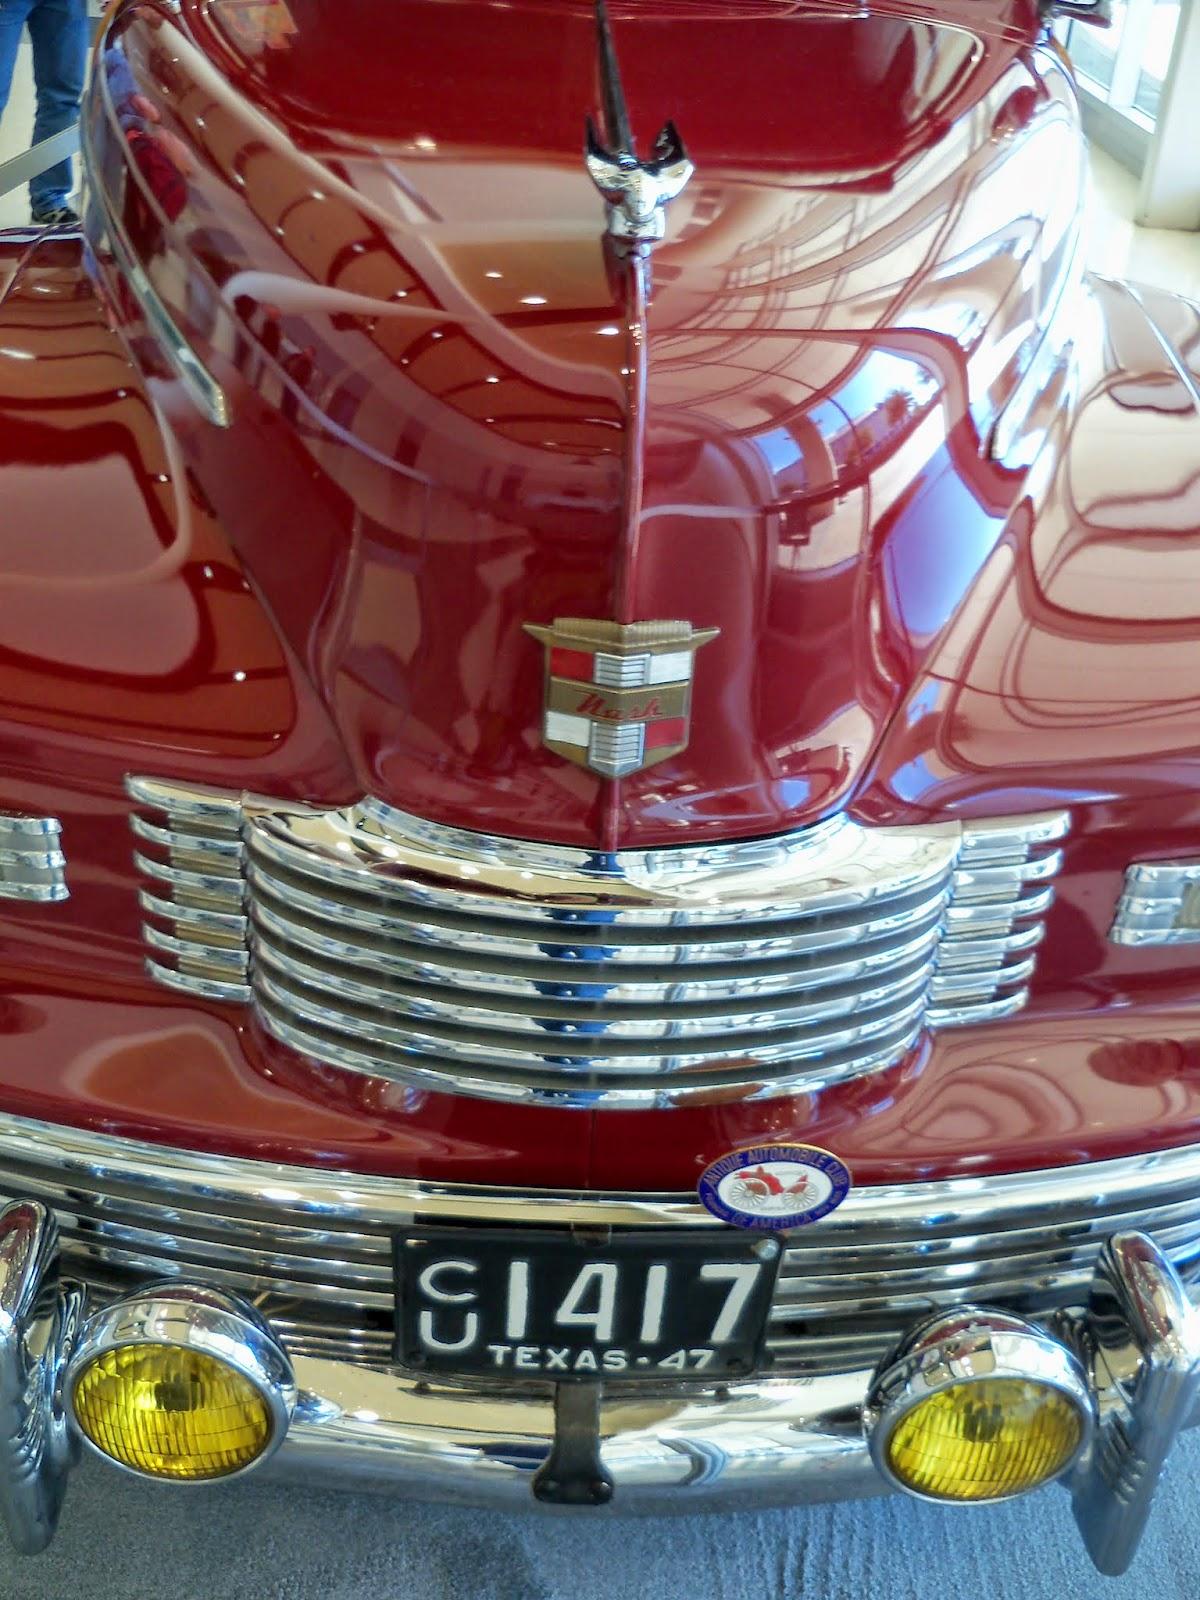 Houston Auto Show 2015 - 116_7209.JPG